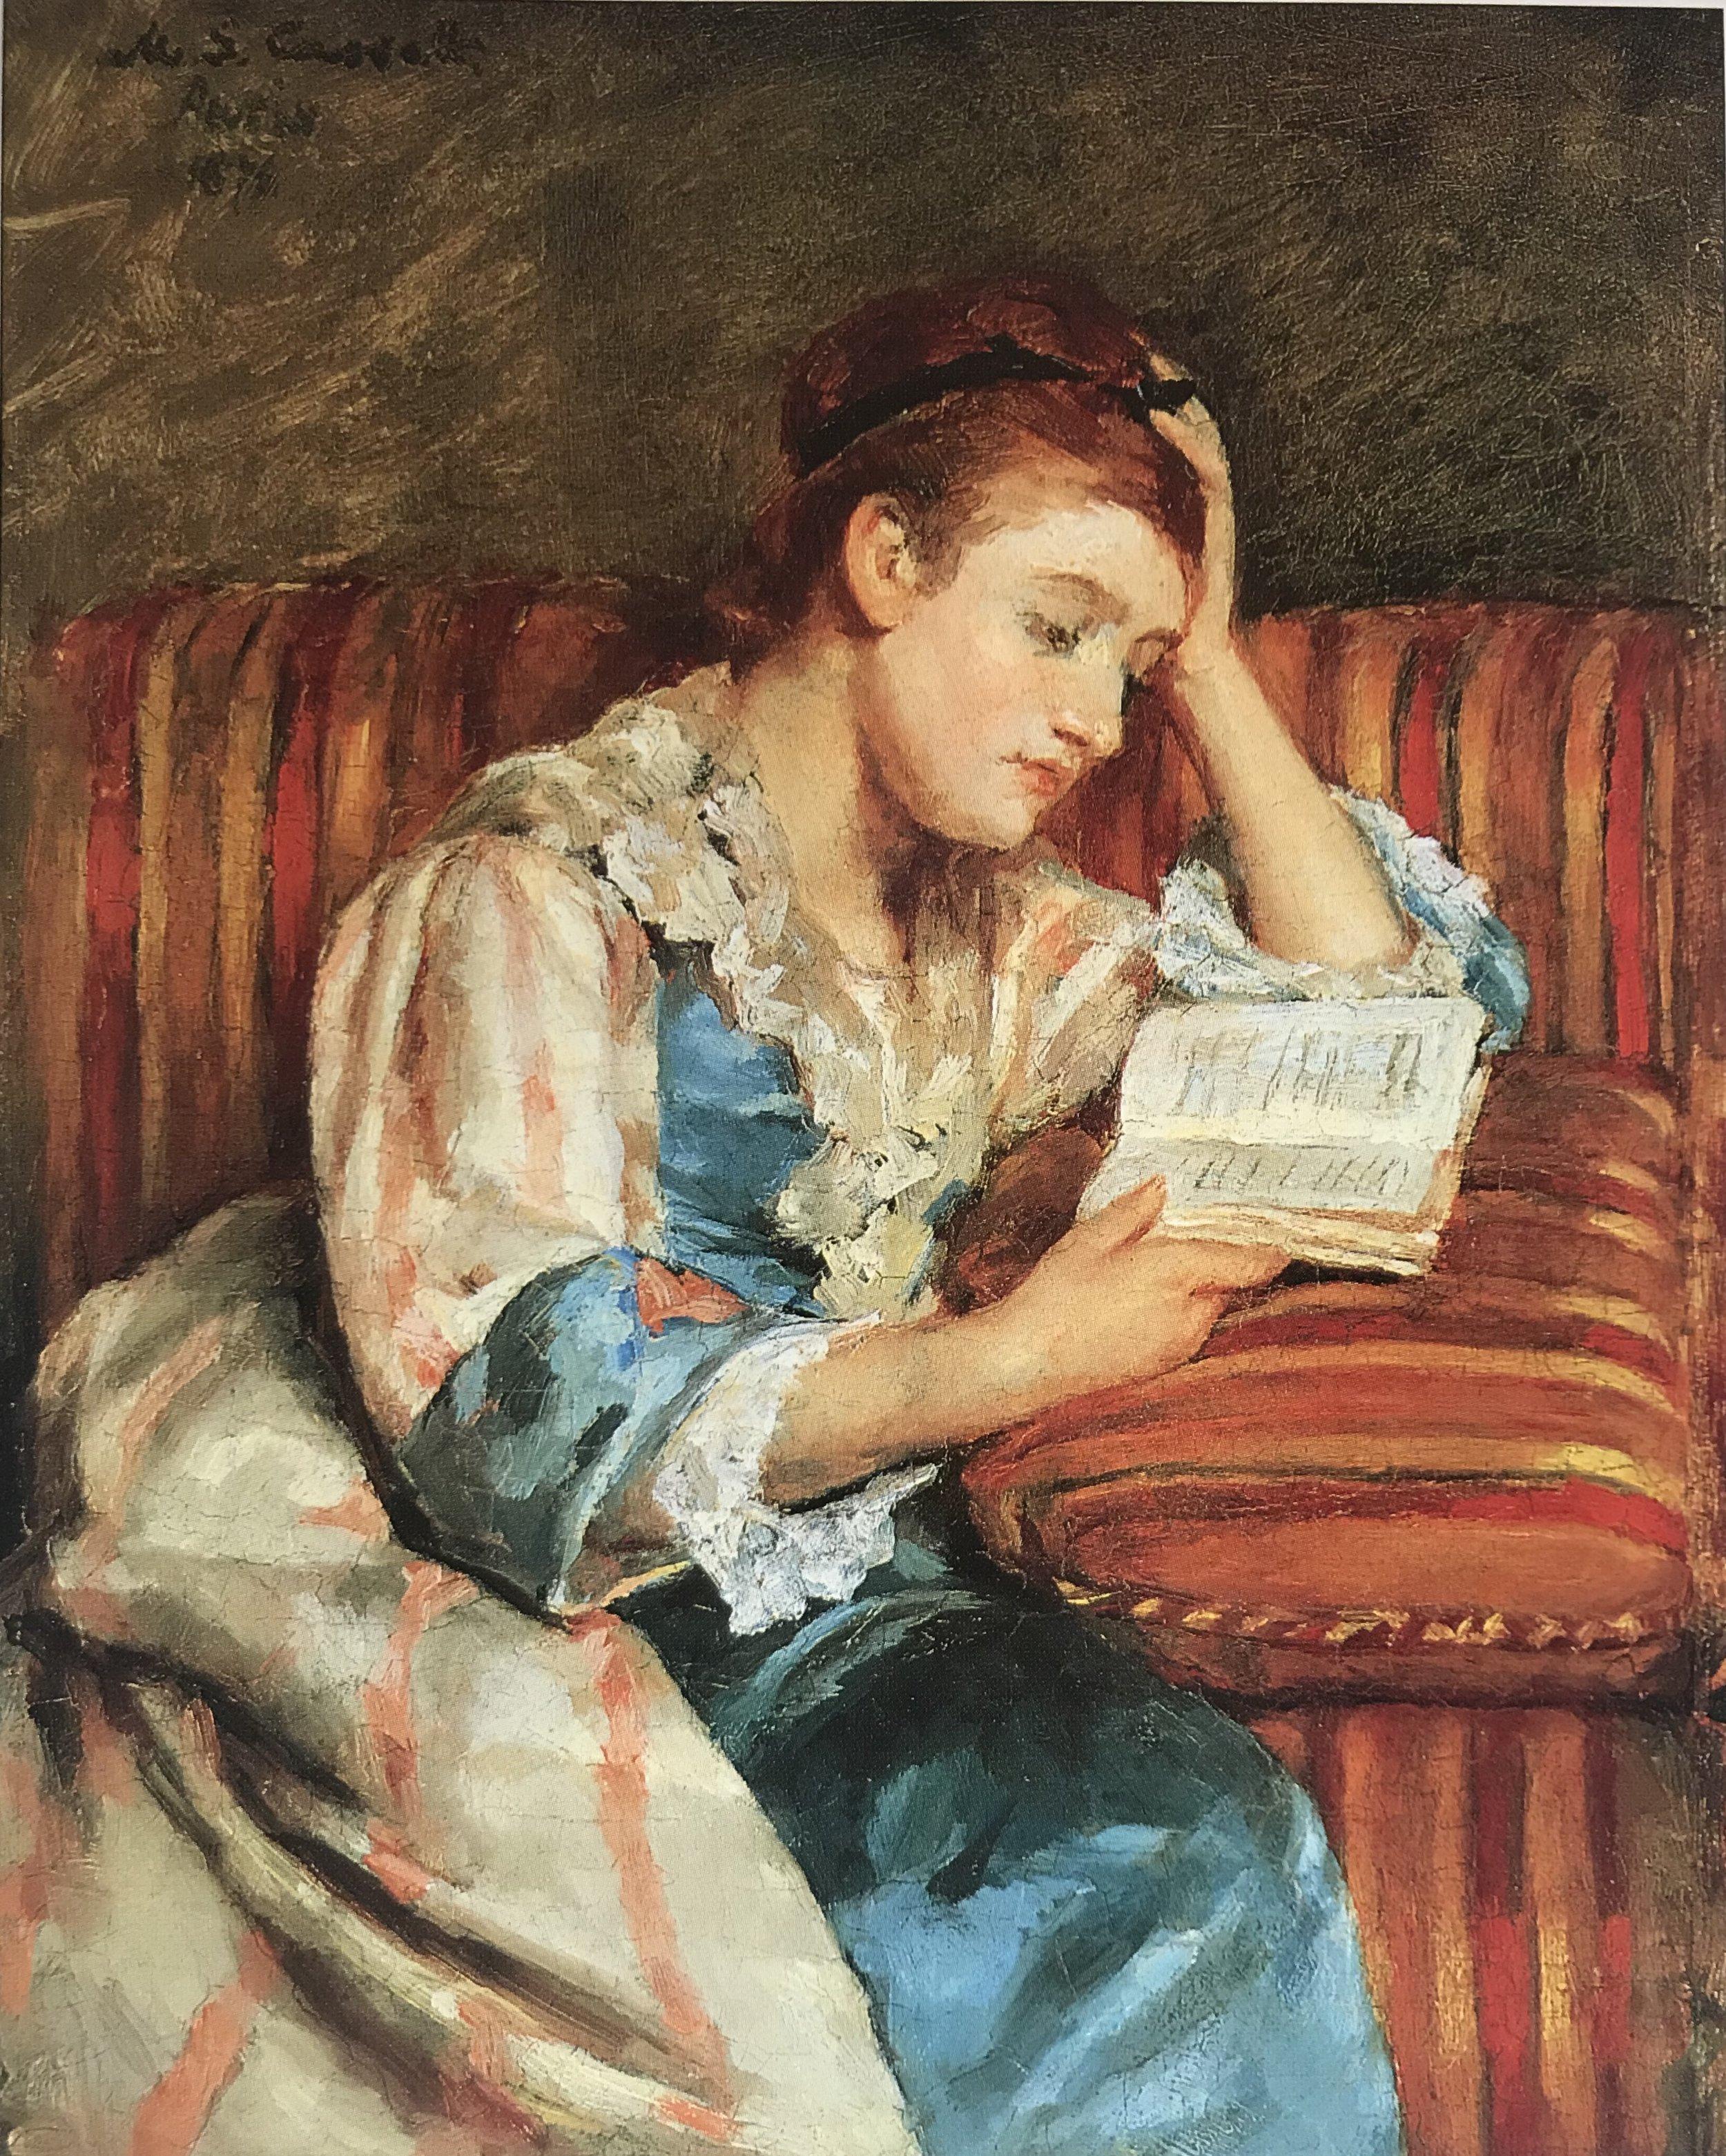 Young Woman Reading - Mary Cassatt circa 1878